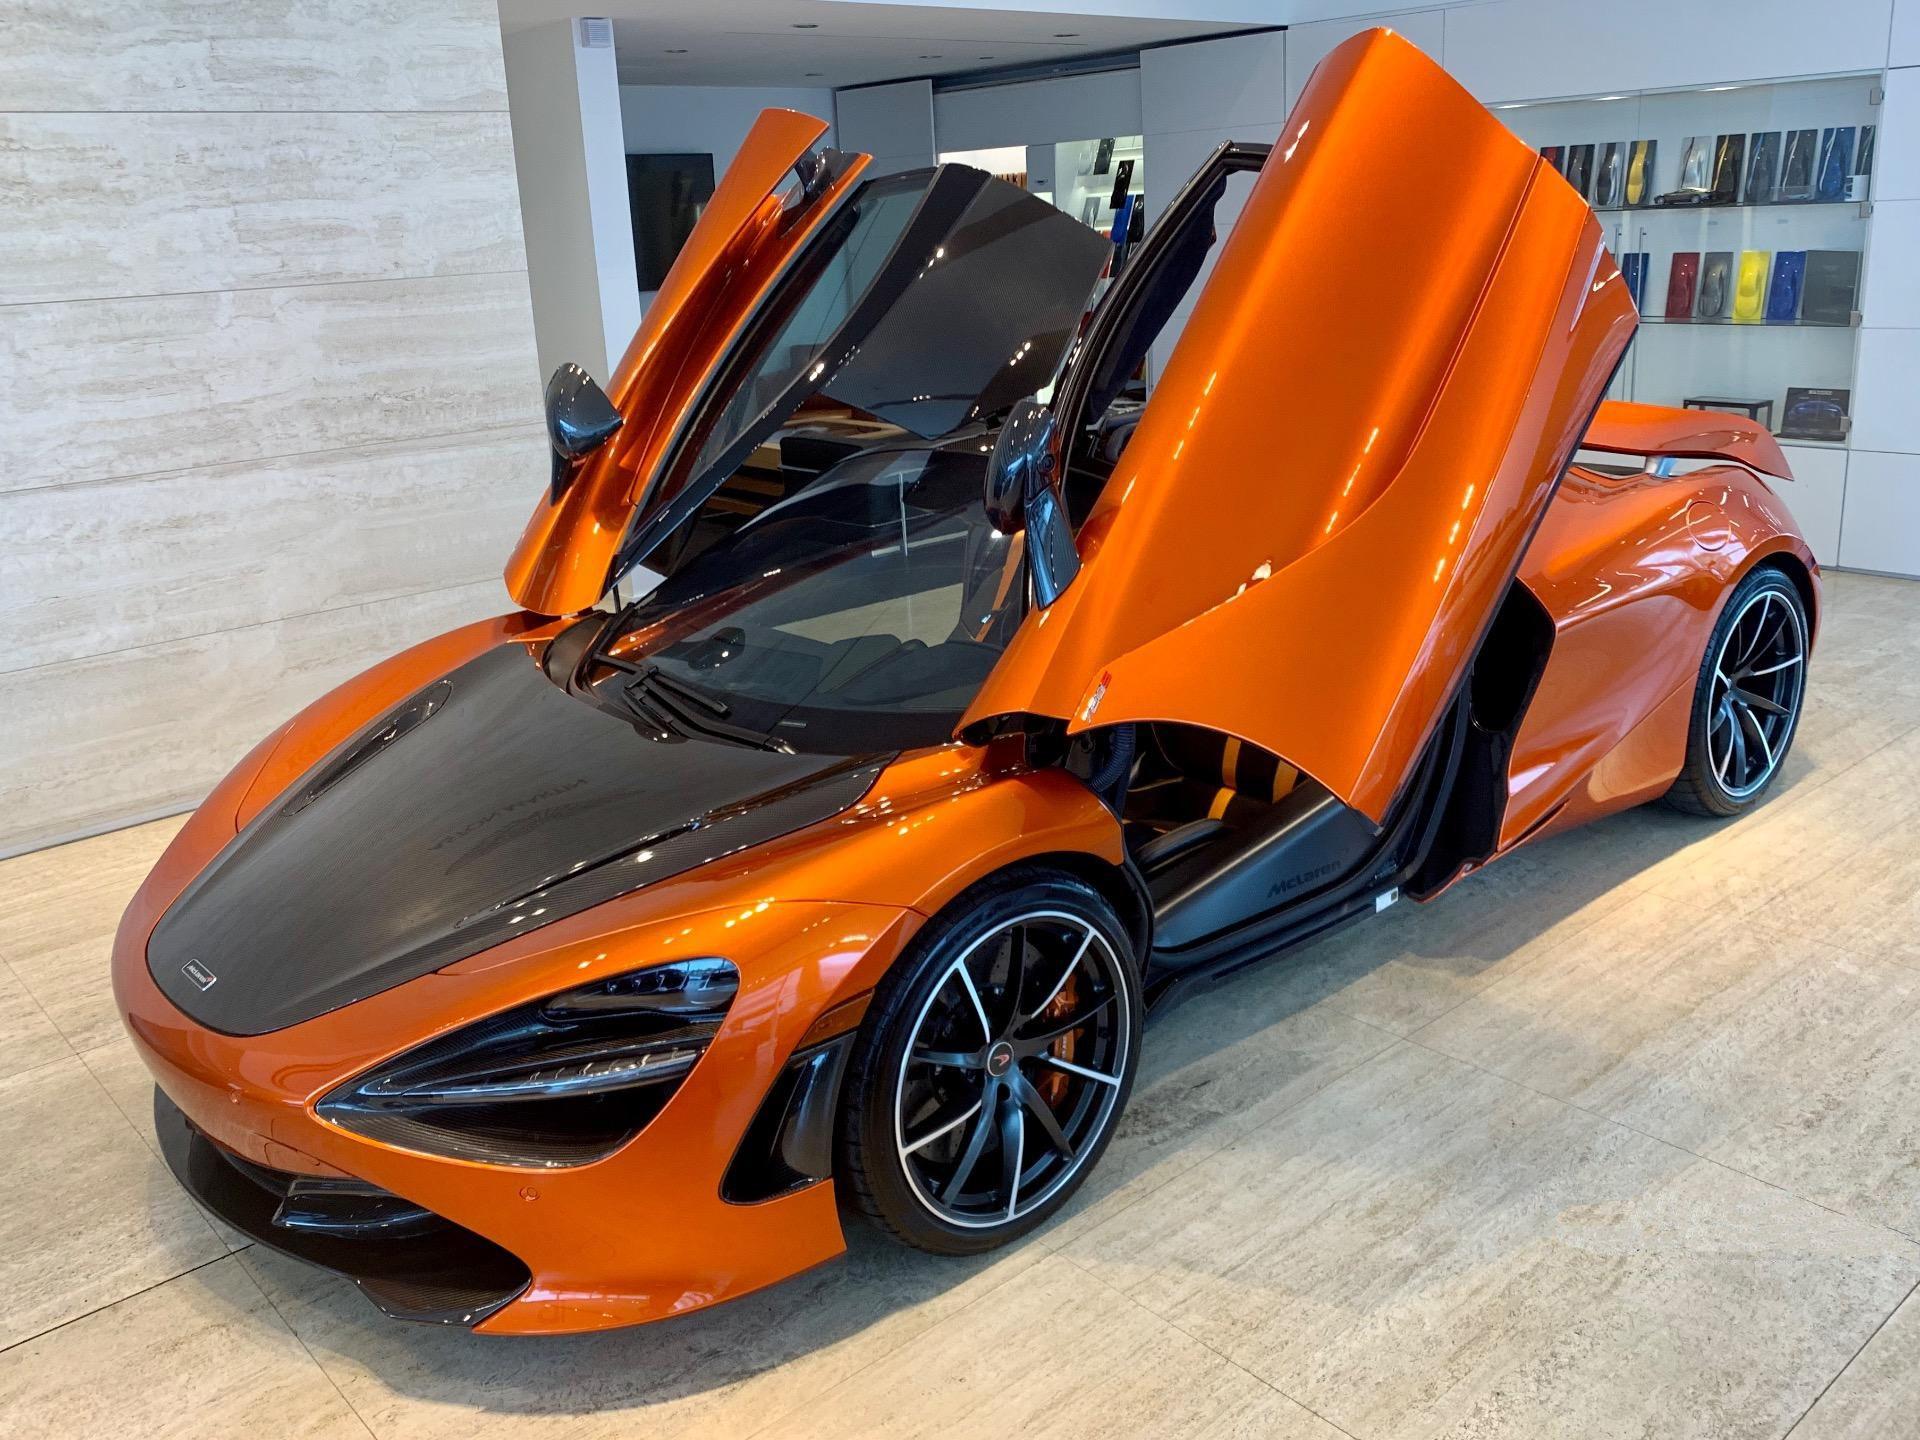 2018 Mclaren 720s Mclaren Super Cars Luxury Cars